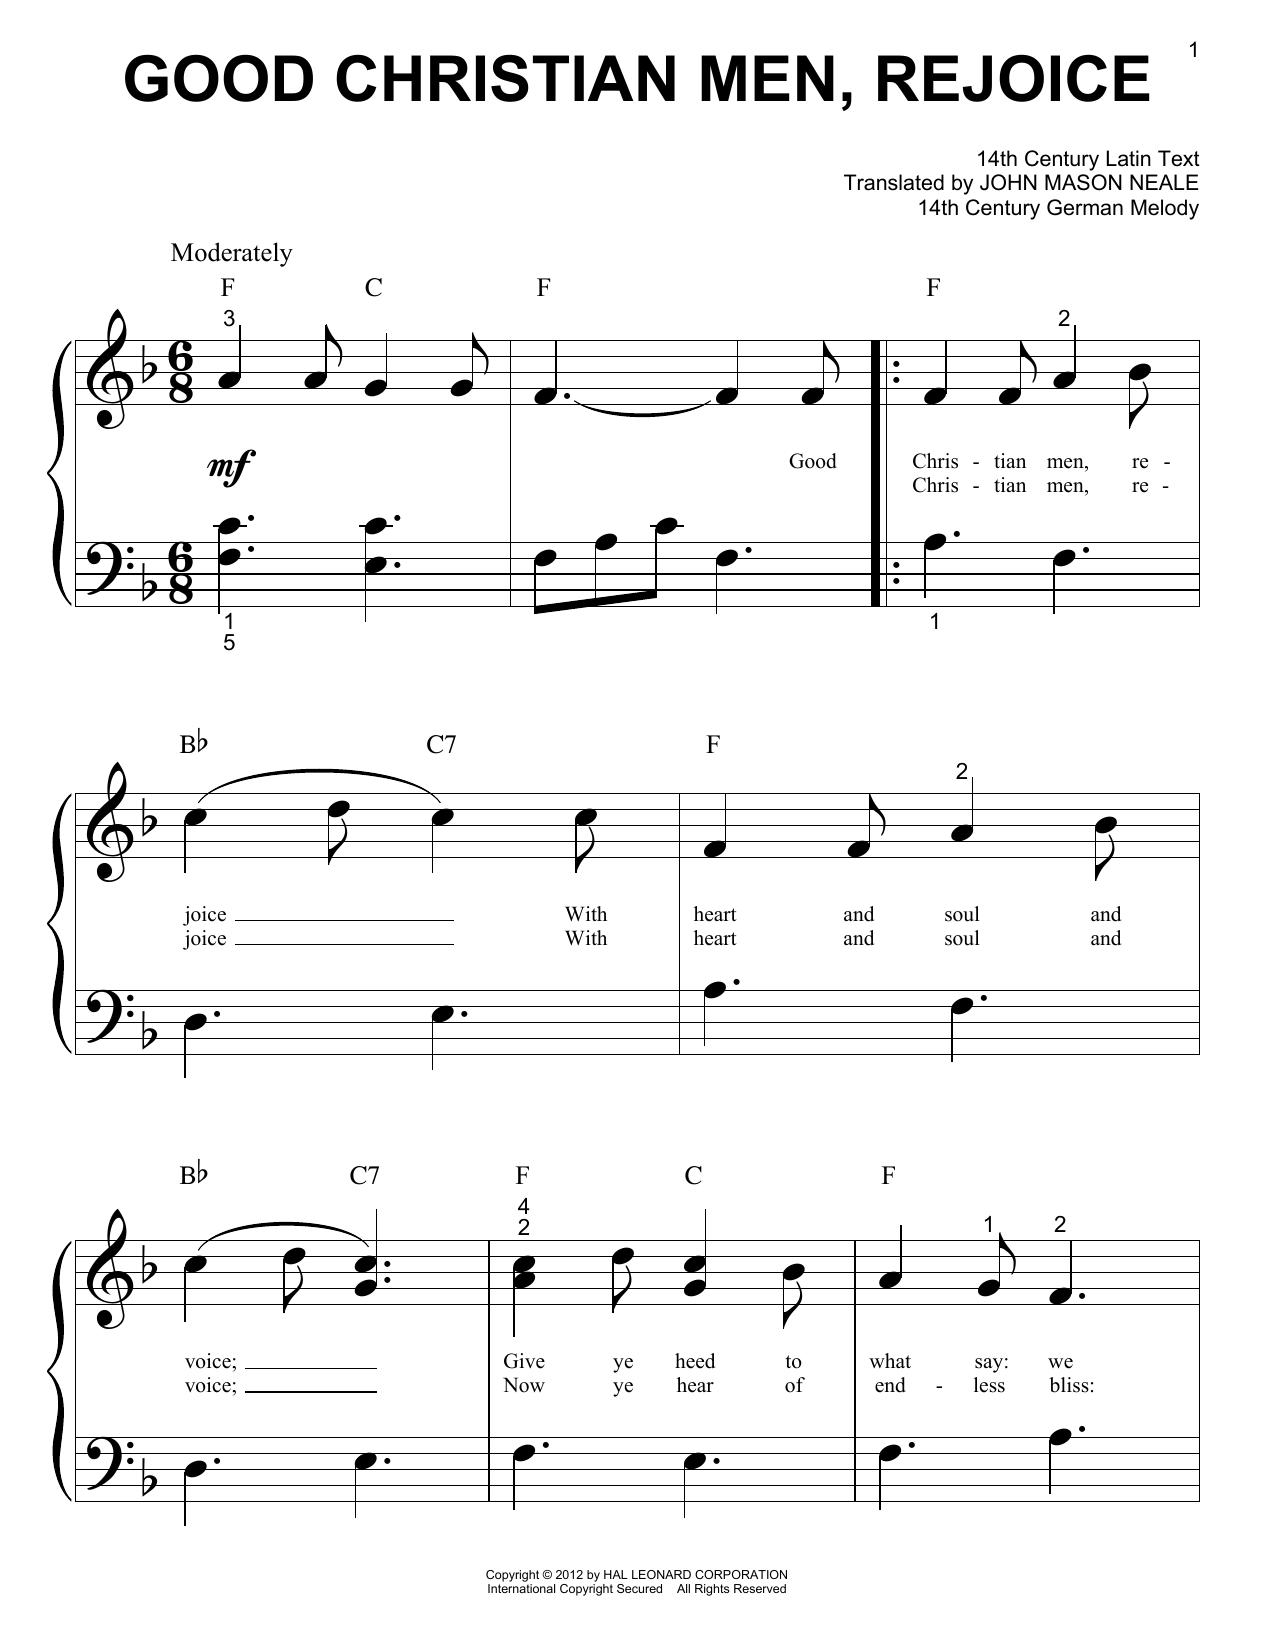 Christmas Carol Good Christian Men Rejoice sheet music notes and chords